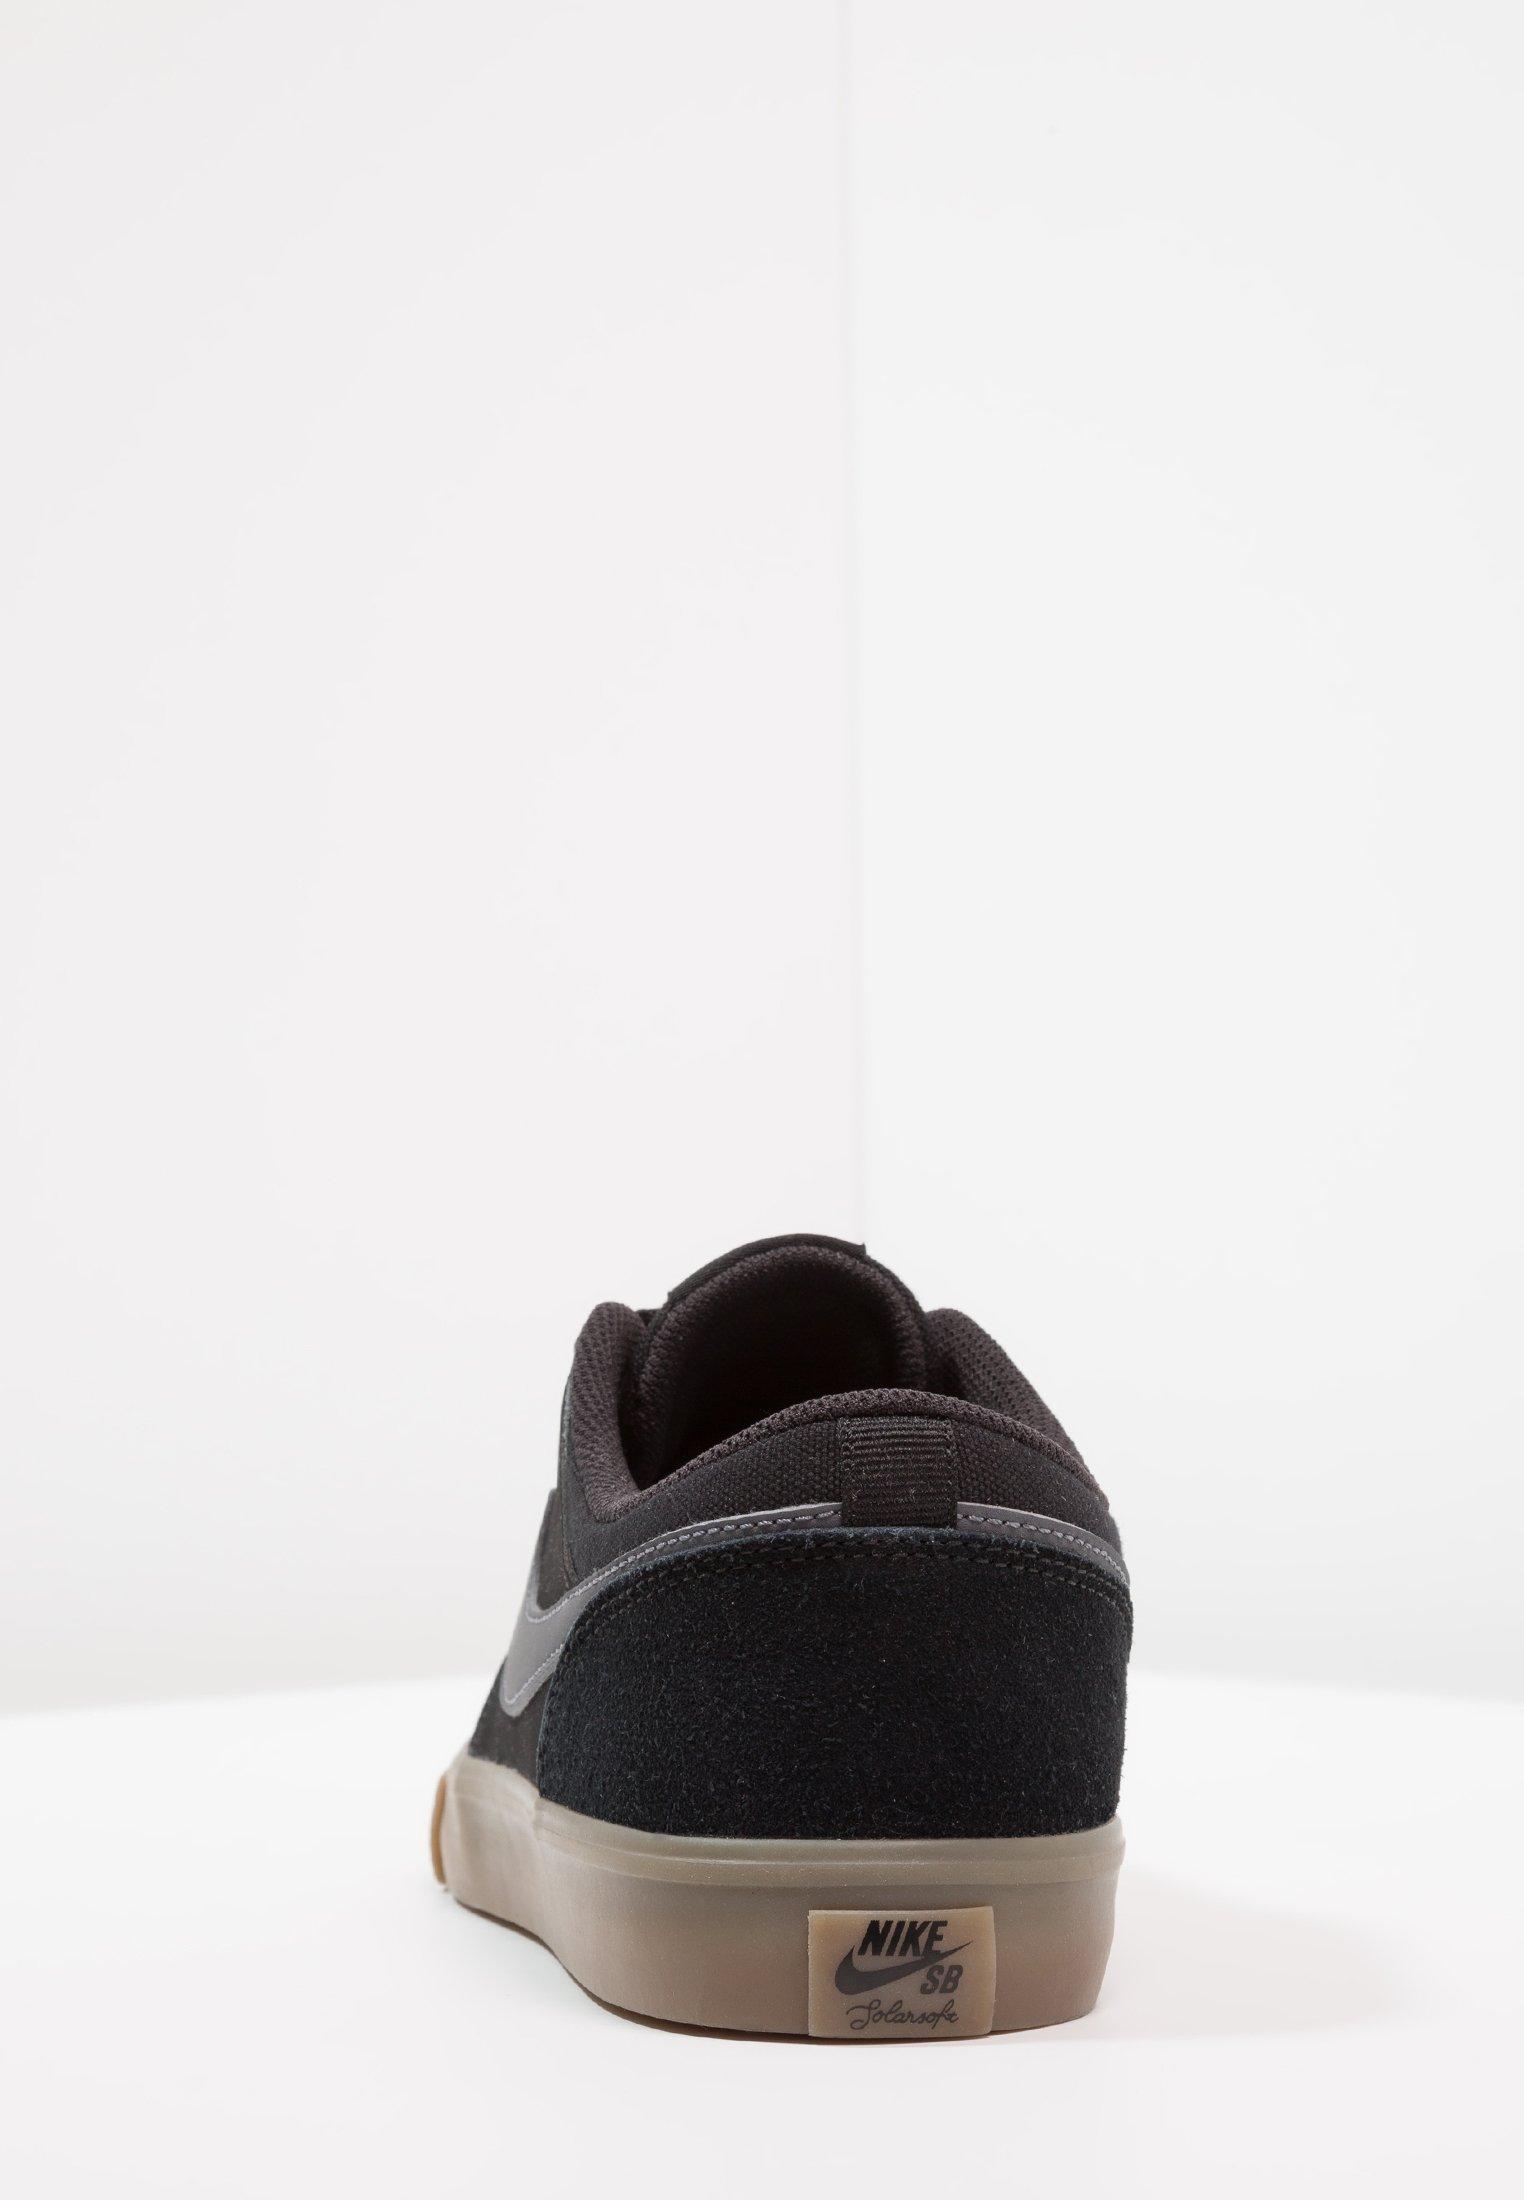 PORTMORE II SOLAR Chaussures de skate blacklight browndark grey